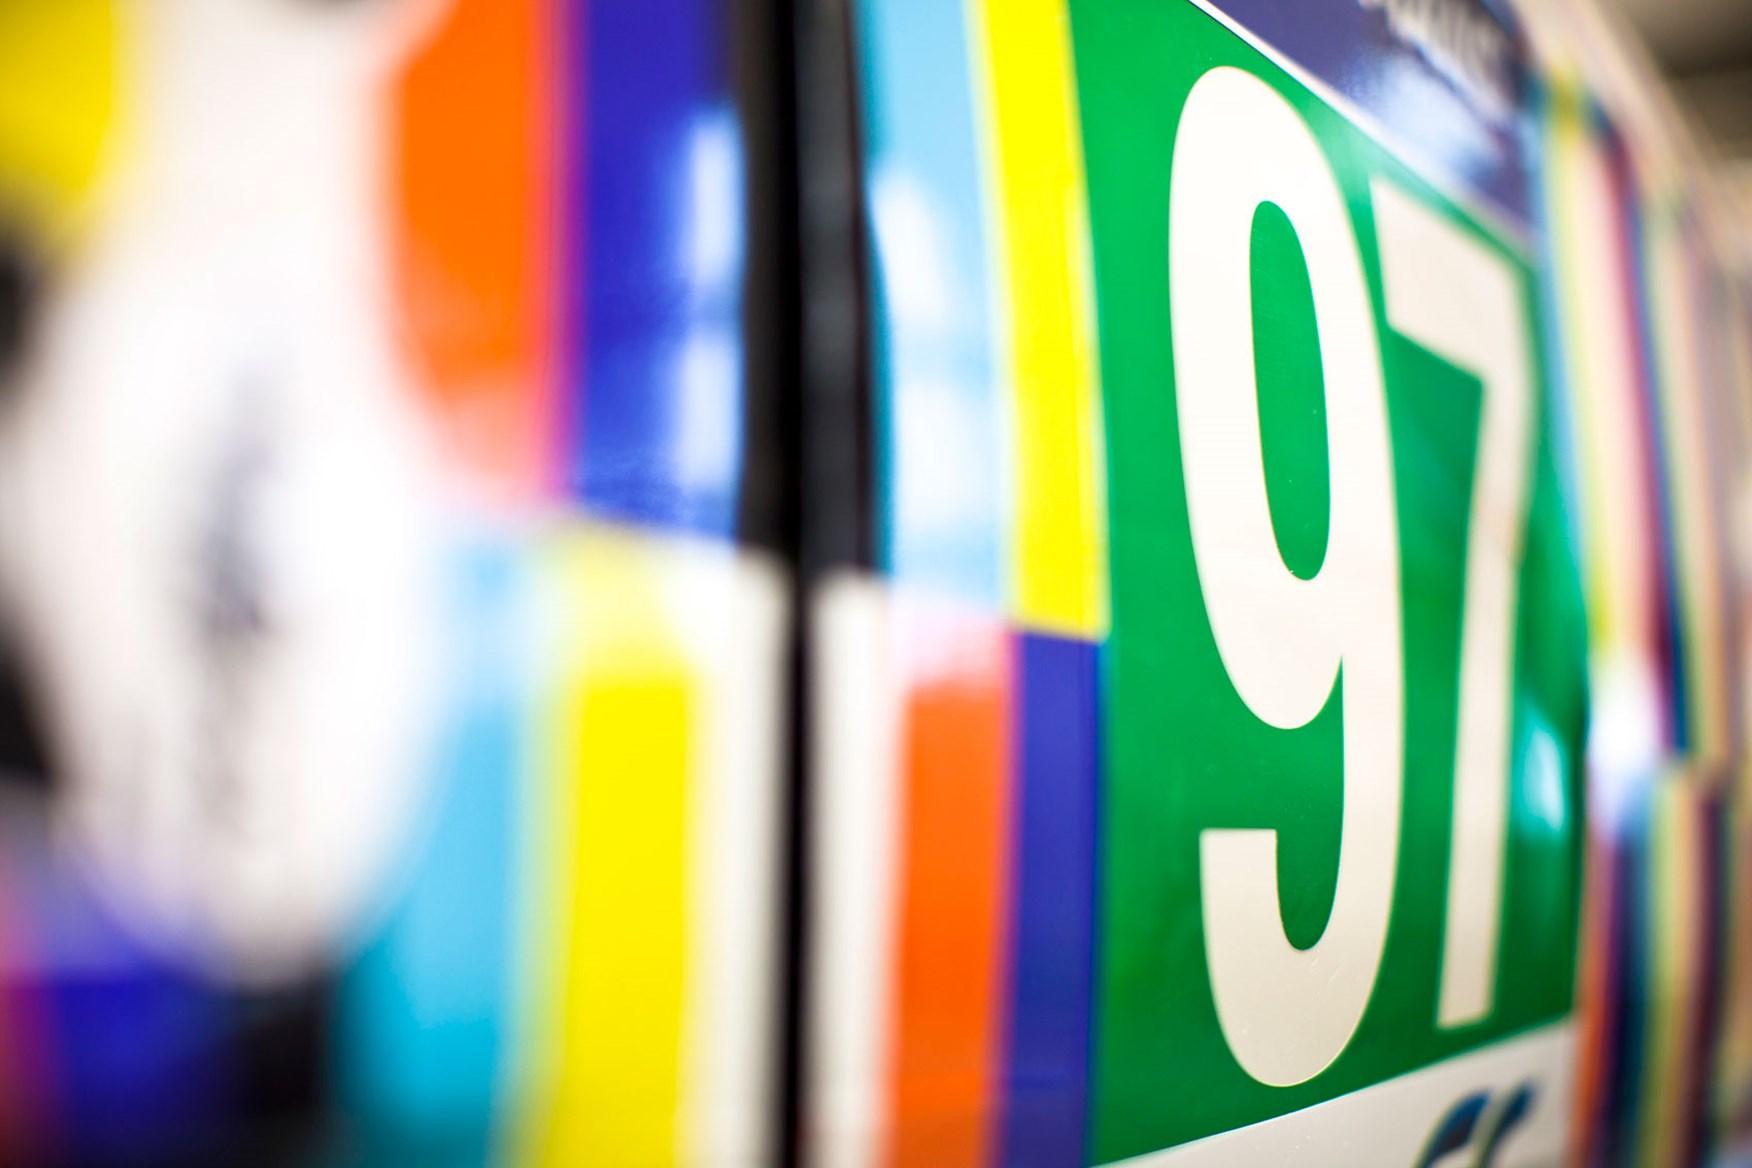 ... Geometric Patterns, Bright Colours For Vantage Art Car